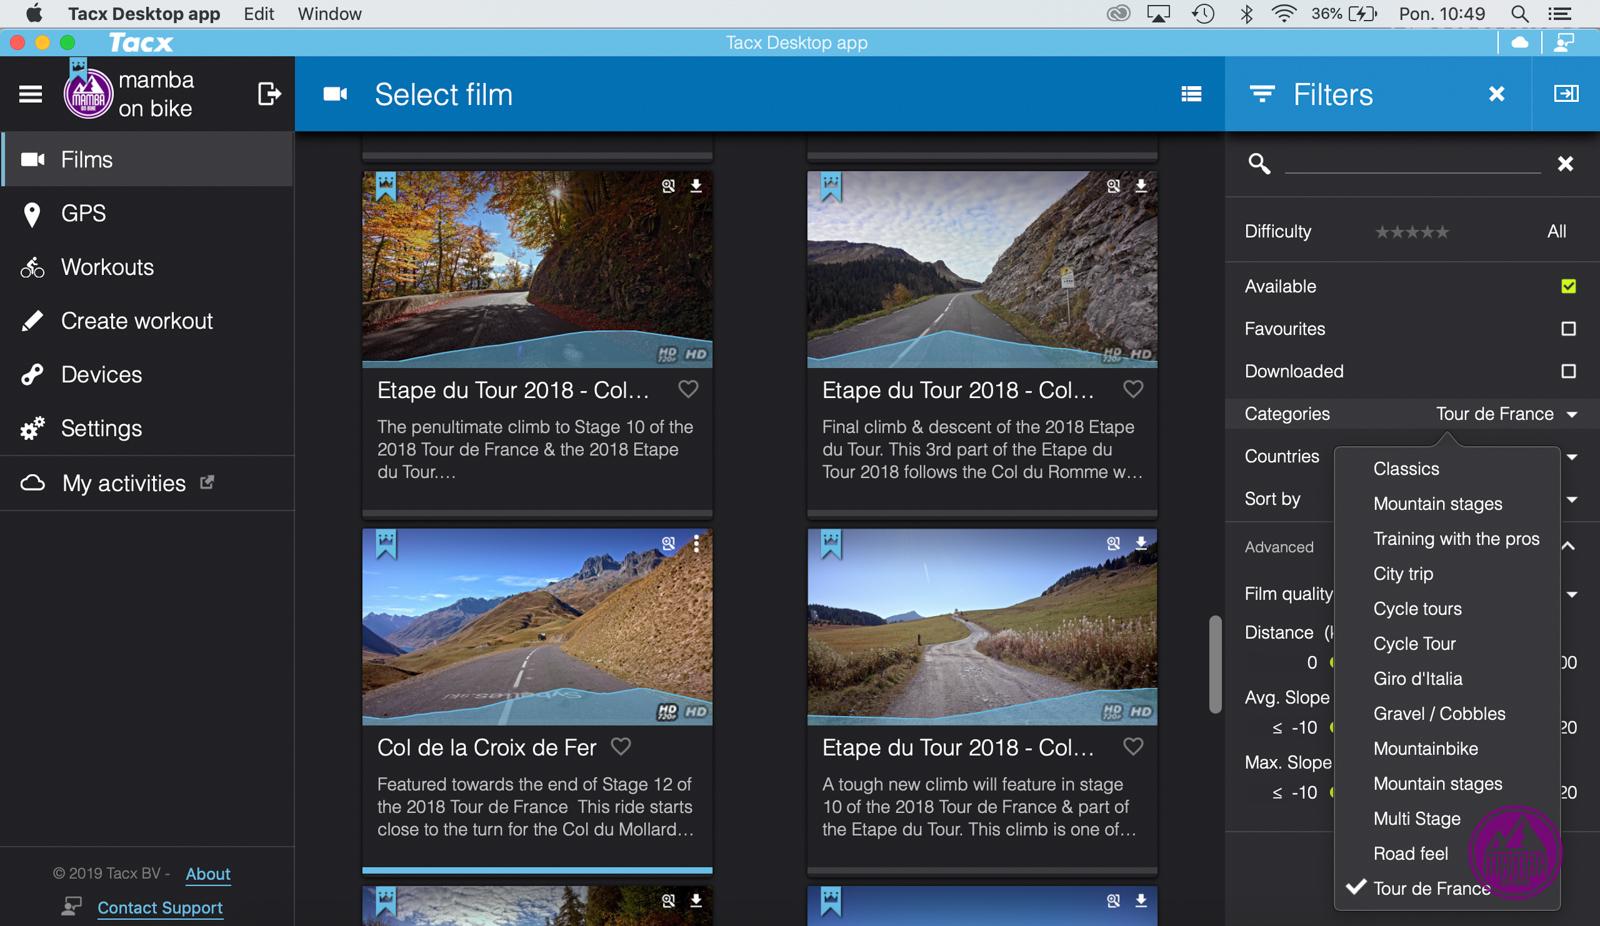 Tacx Desktop App - Giro